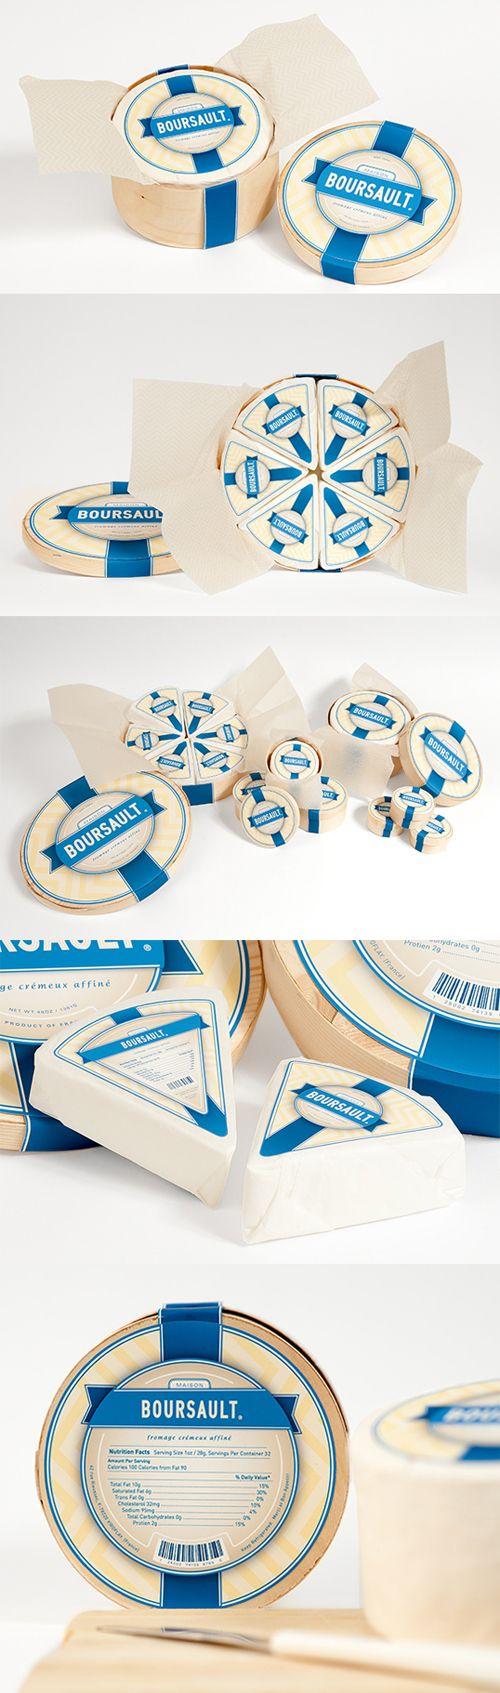 BOURSAULT cheese packaging designed by Samantha Szakolczay